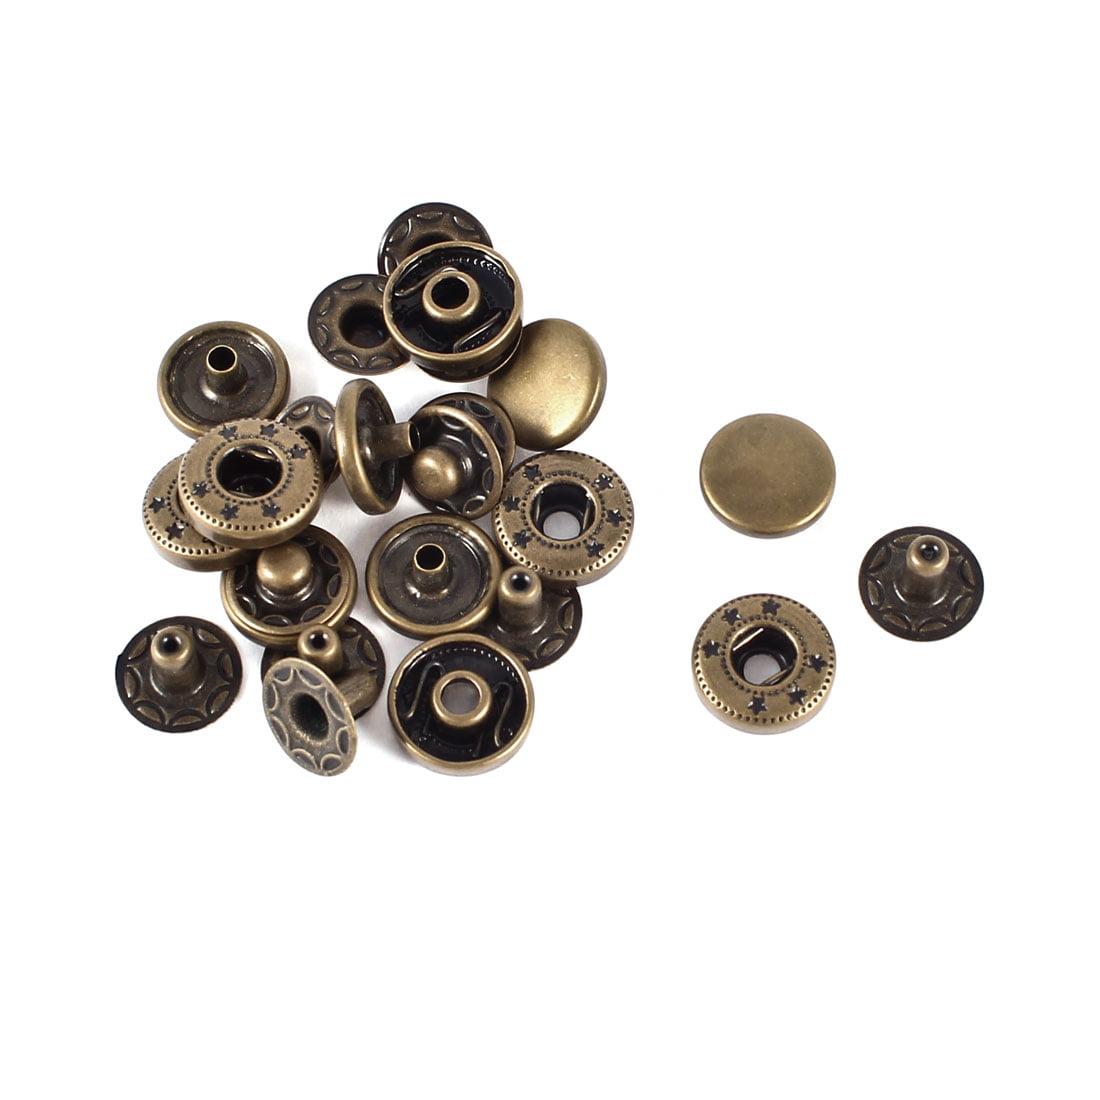 "Unique Bargains 6 Sets Metal Retro Style Snap Fasteners Popper Stud Press Buttons 11.5mm 0.45"""